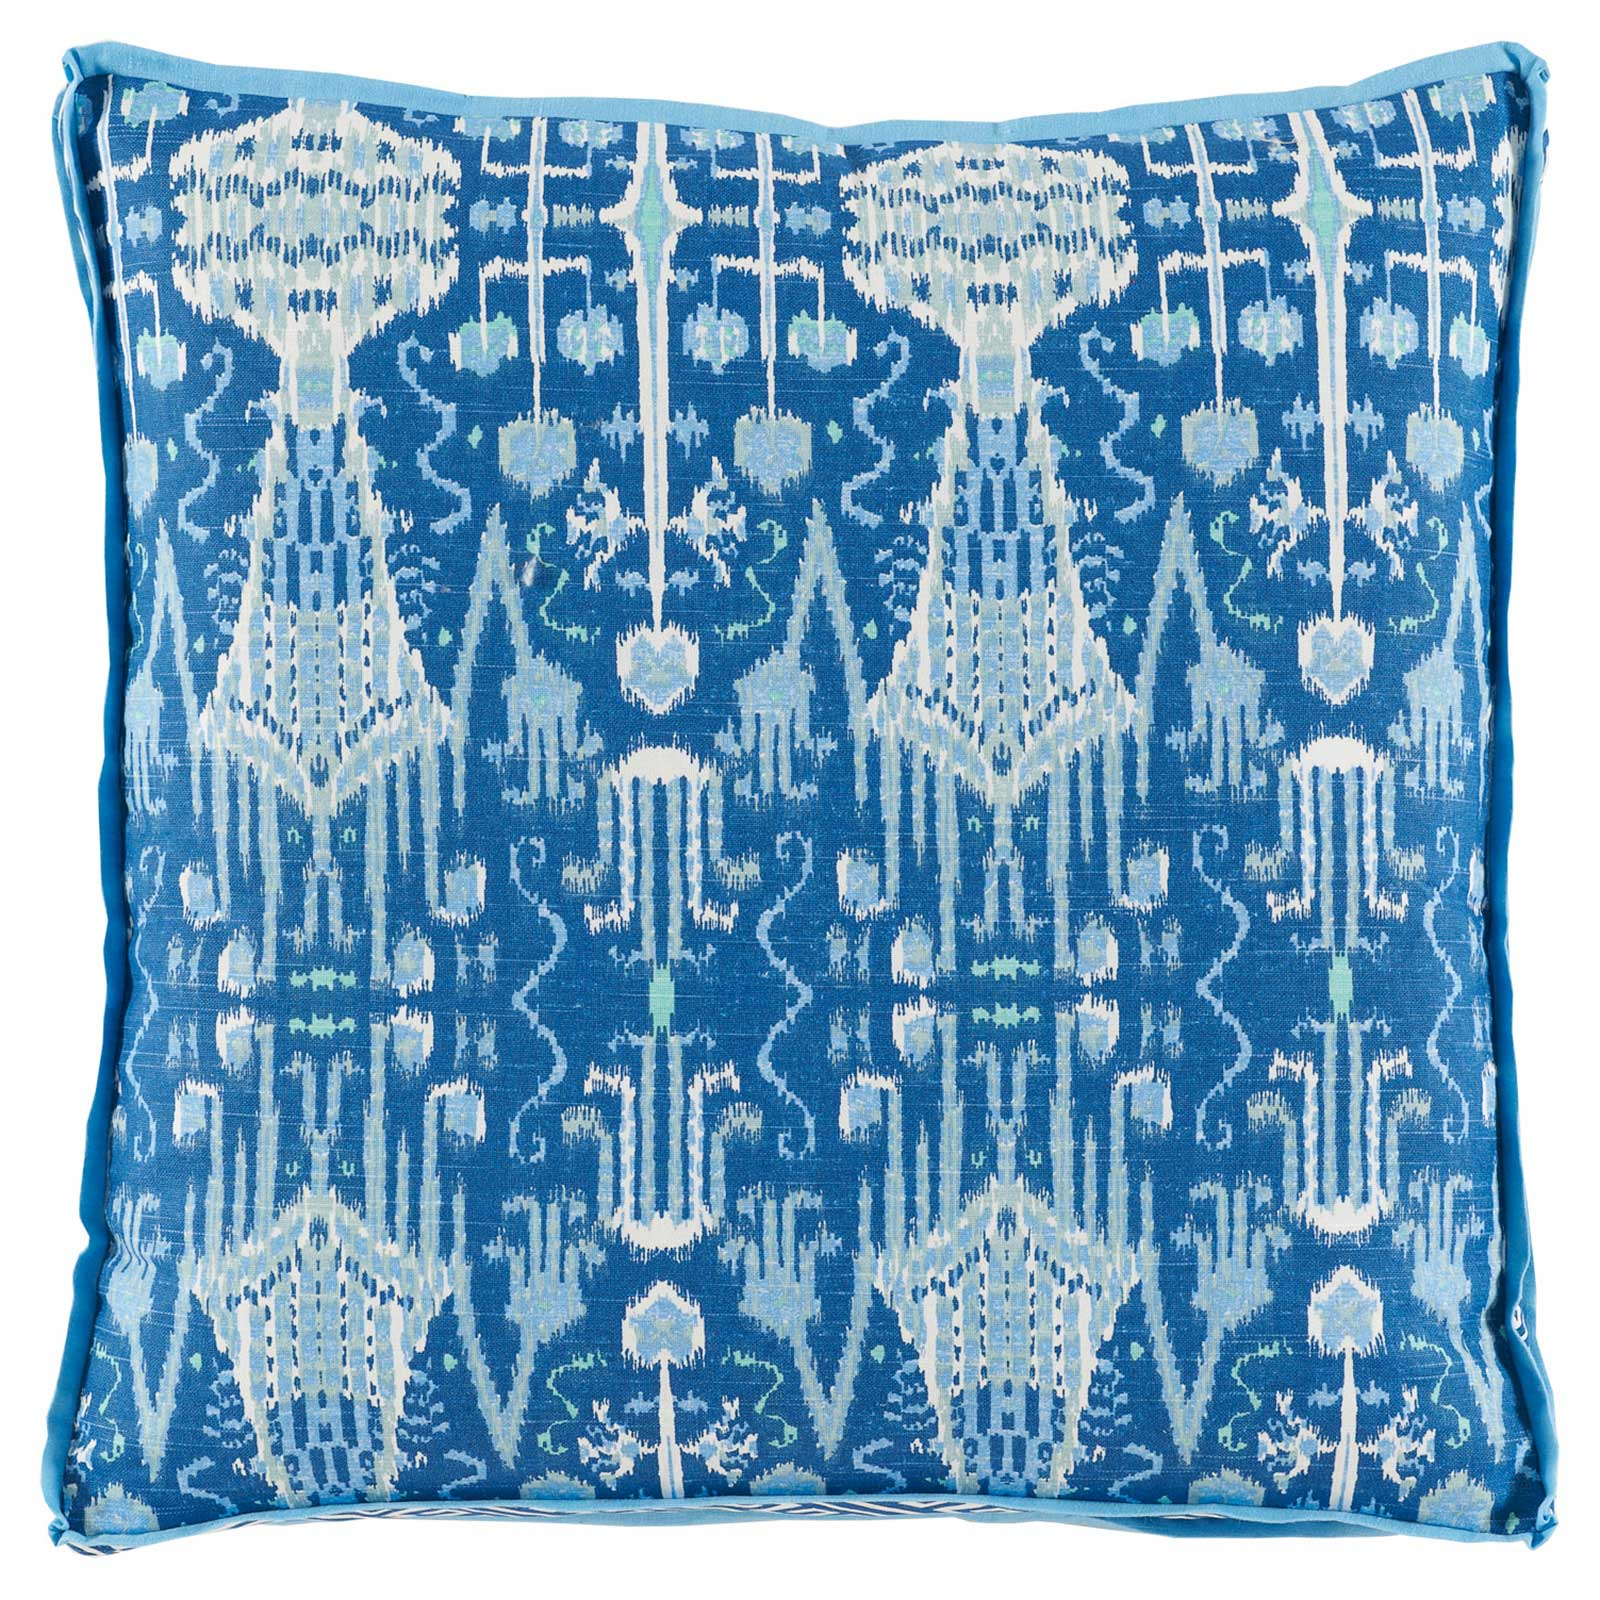 Kolkata Global Bazaar Blue Ikat Pillow - 24x24